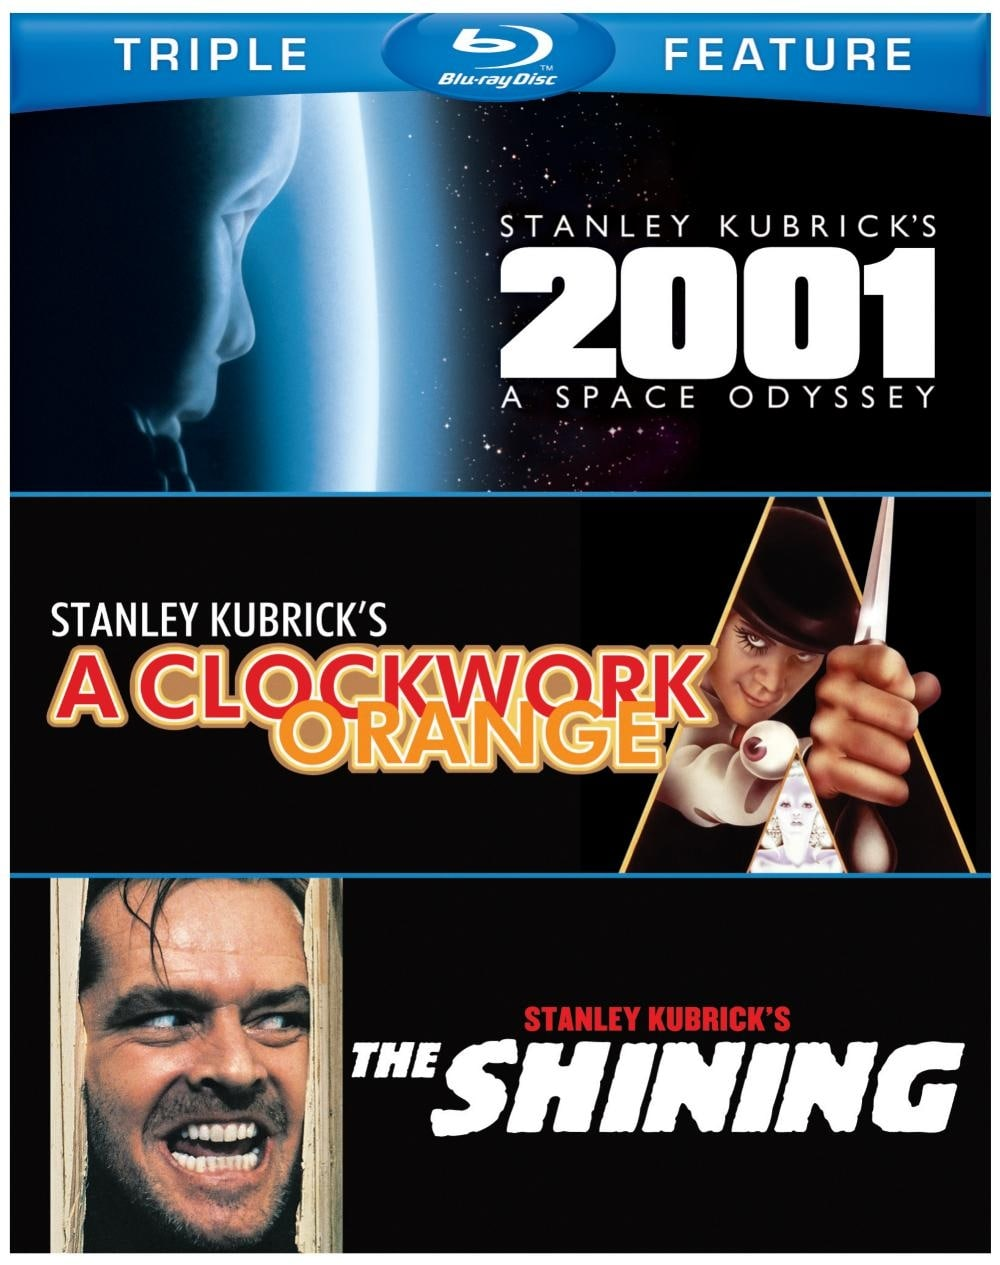 2001: A Space Odyssey/A Clockwork Orange/The Shining (Blu-ray Disc)